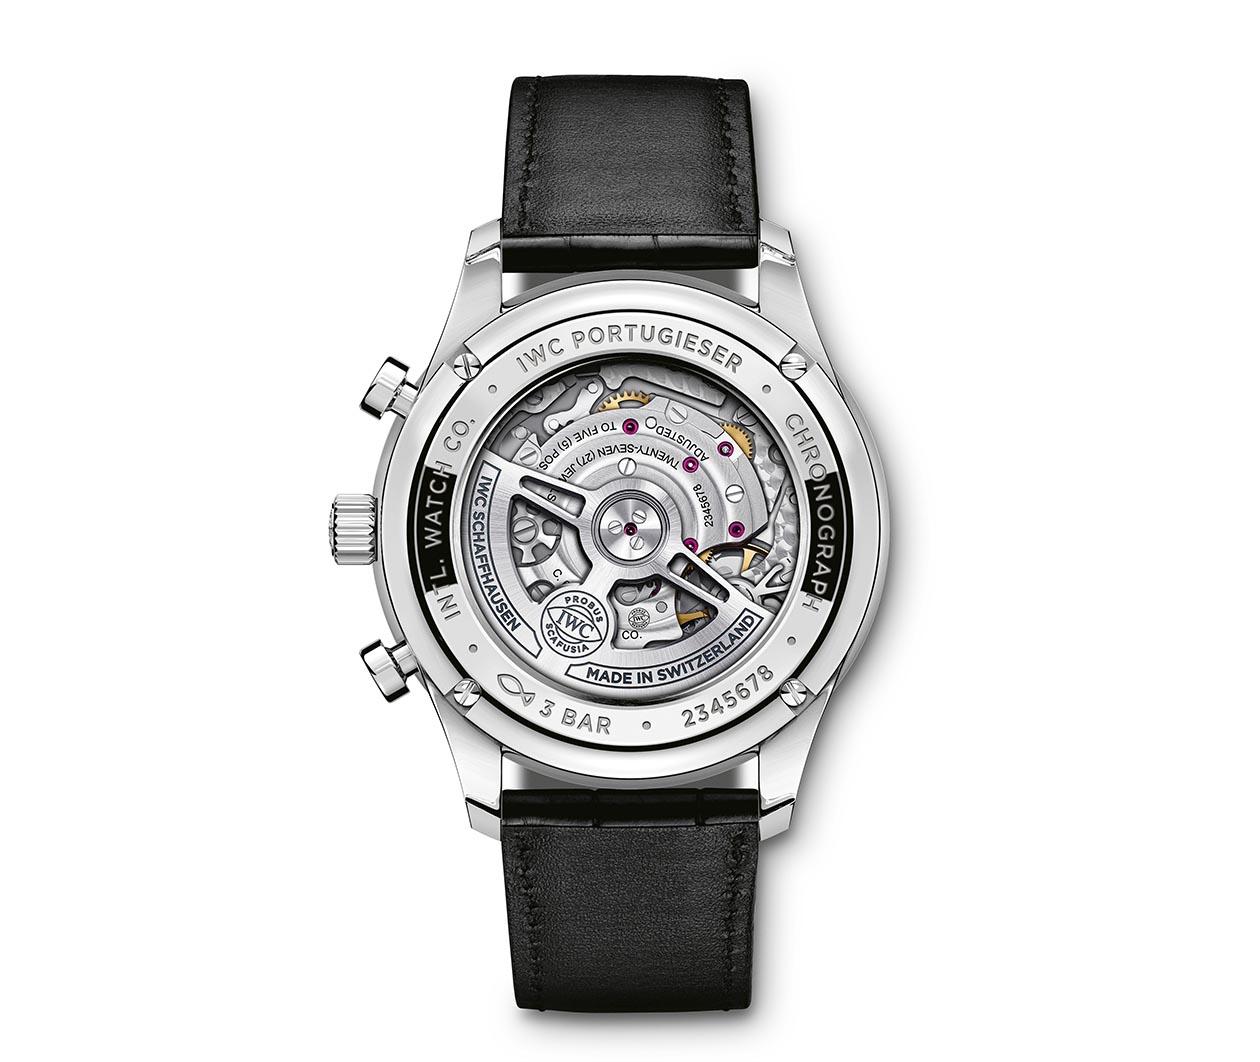 IWC Portugieser Chronograph IW371616 Carousel 2 FINAL